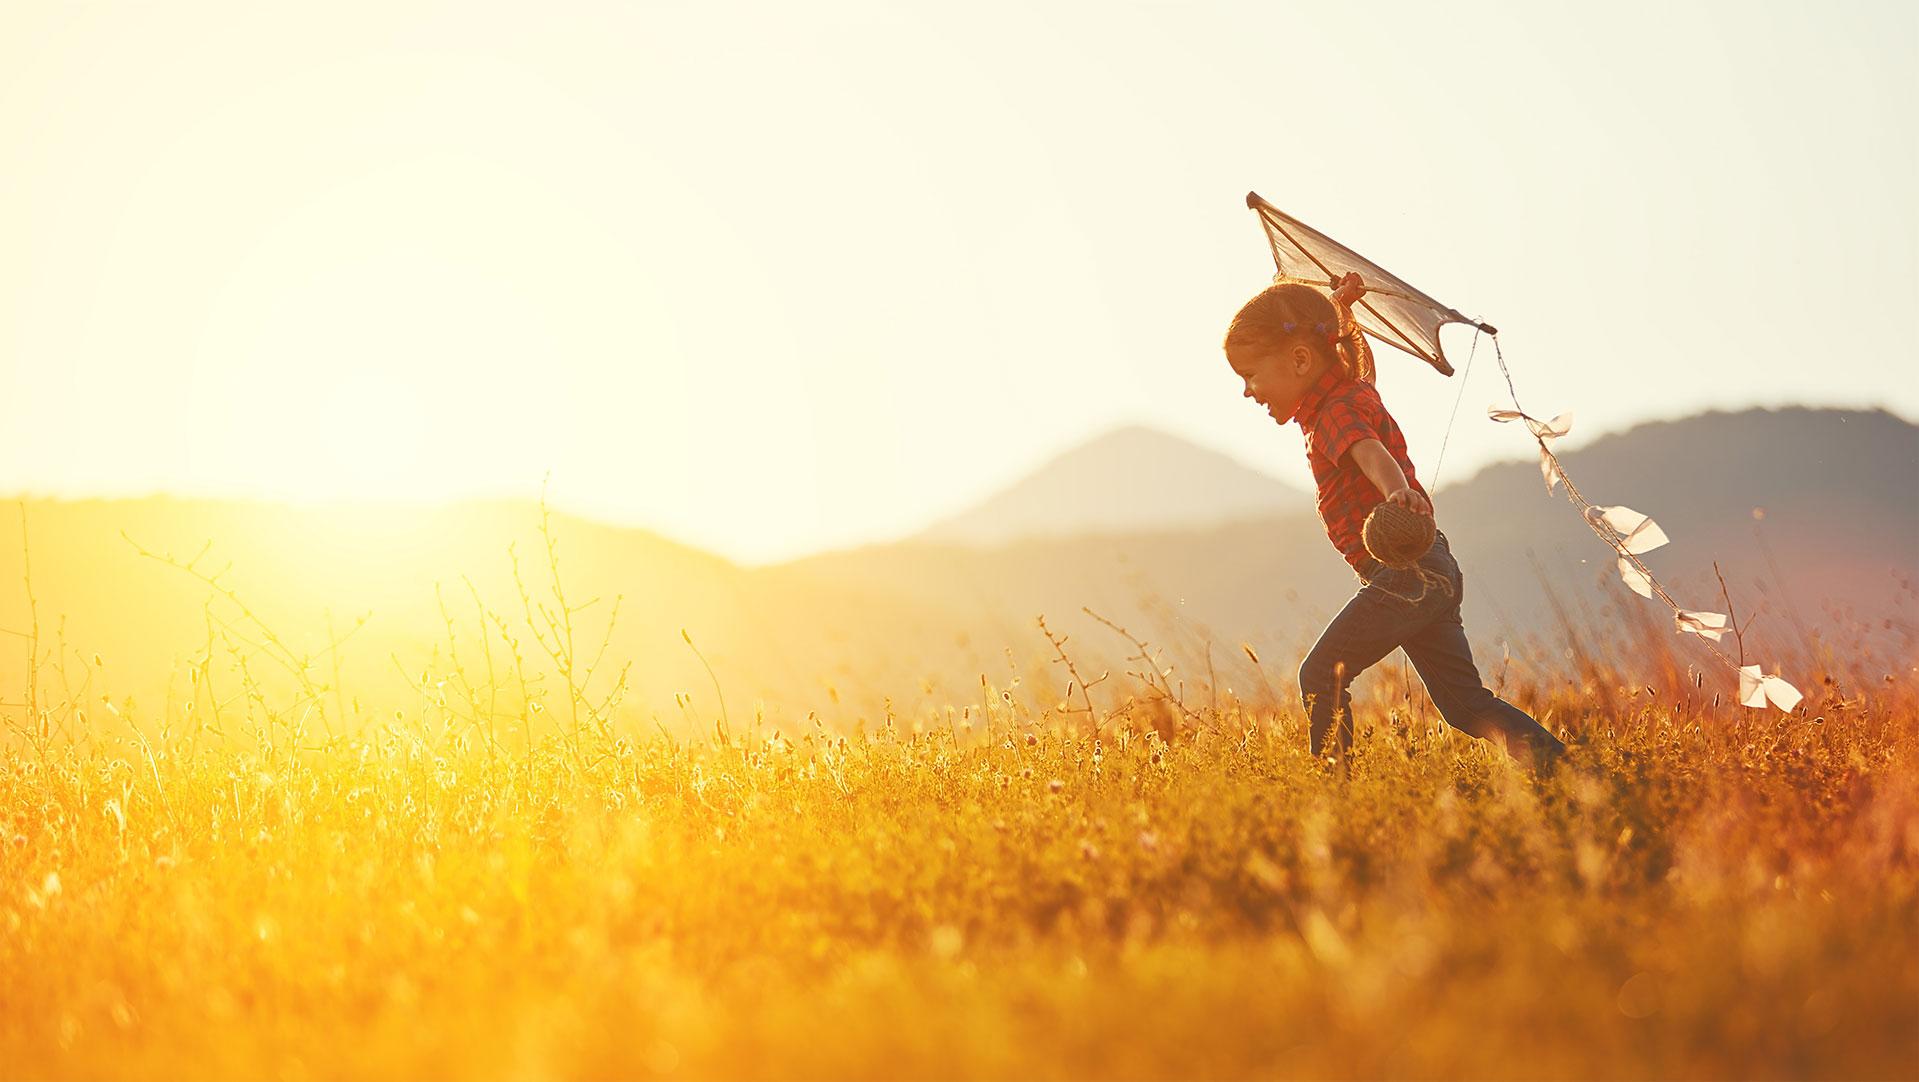 Solar Energy Kite Run